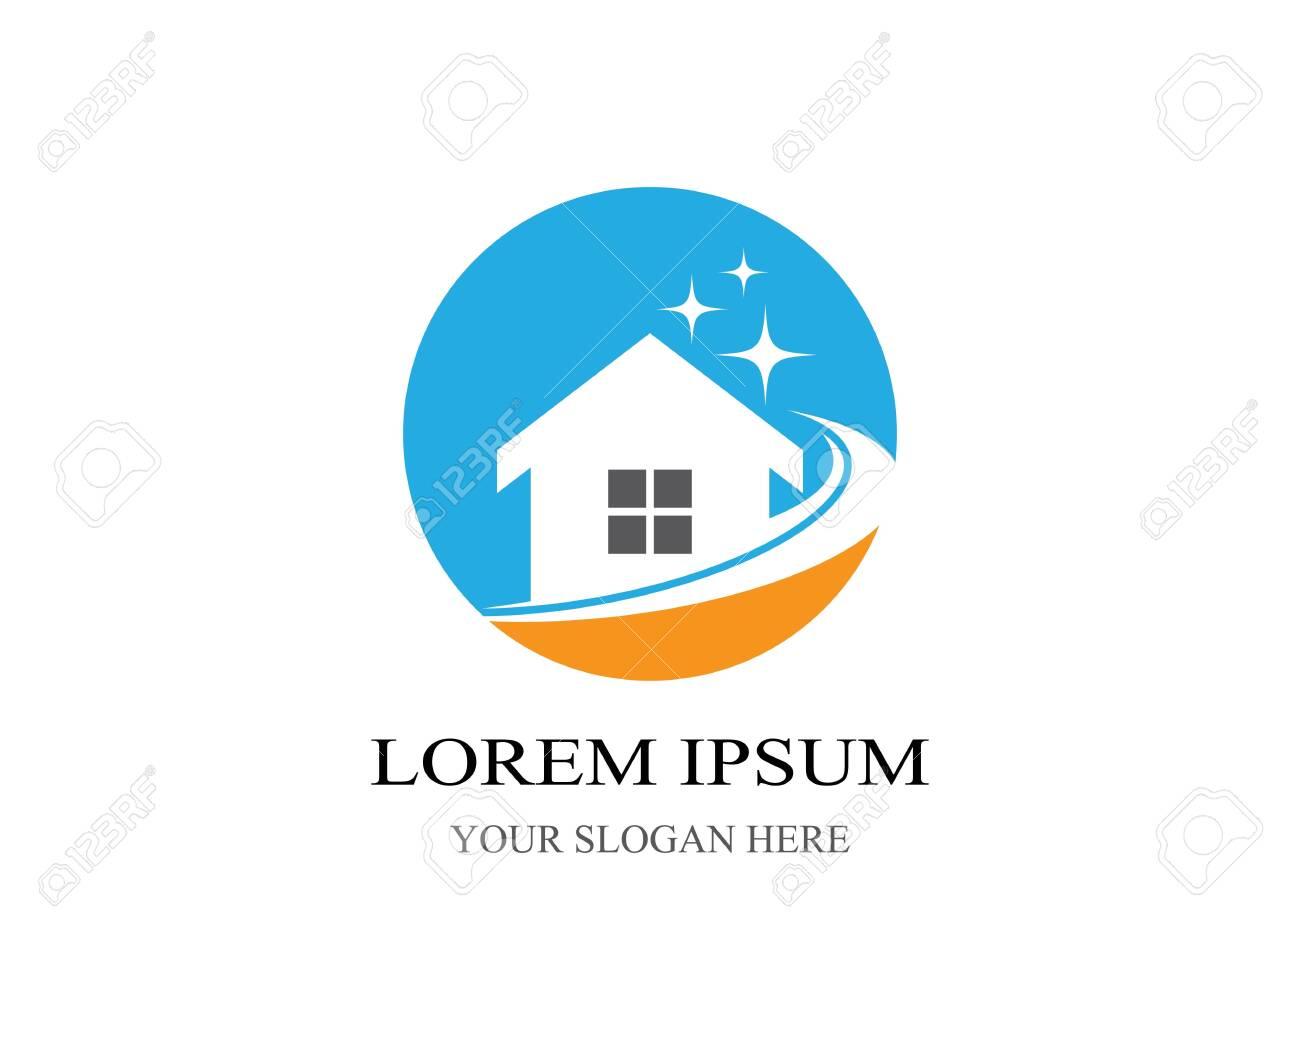 House symbol vector illustration design - 145759112